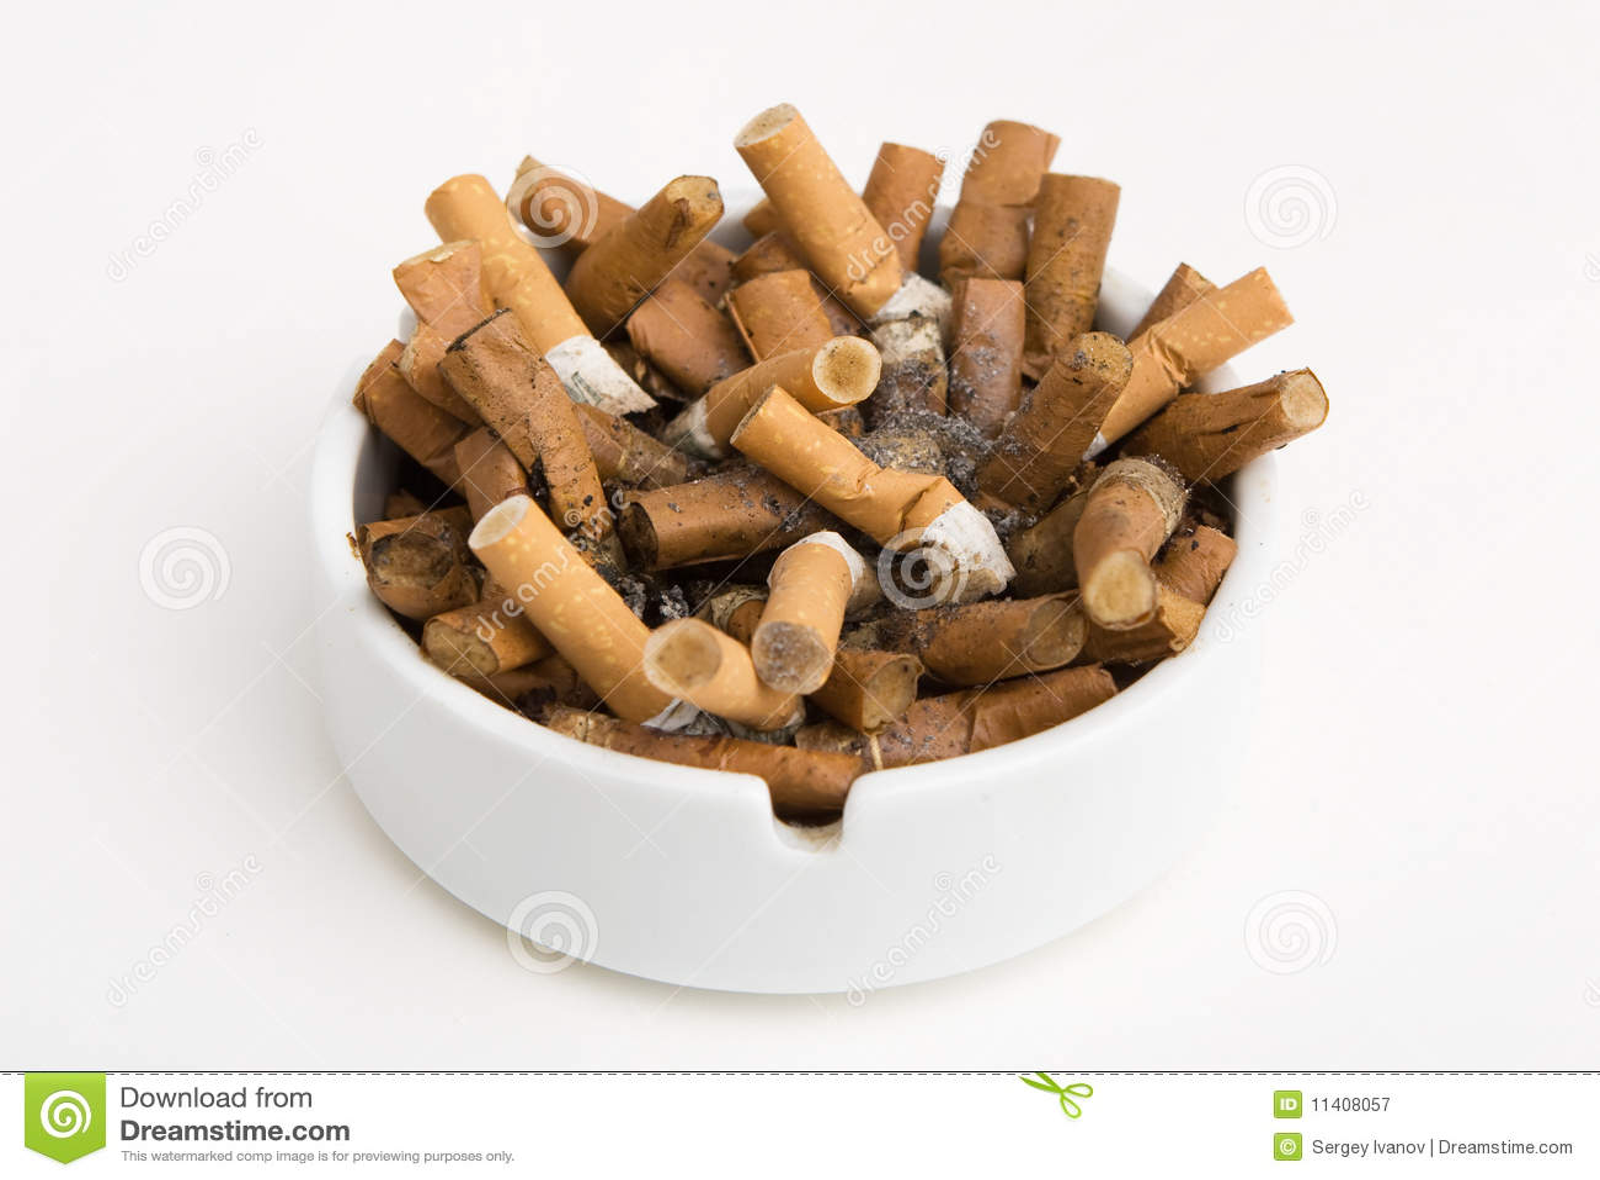 aschenbecher voll zigaretten stockbild bild 11408057. Black Bedroom Furniture Sets. Home Design Ideas